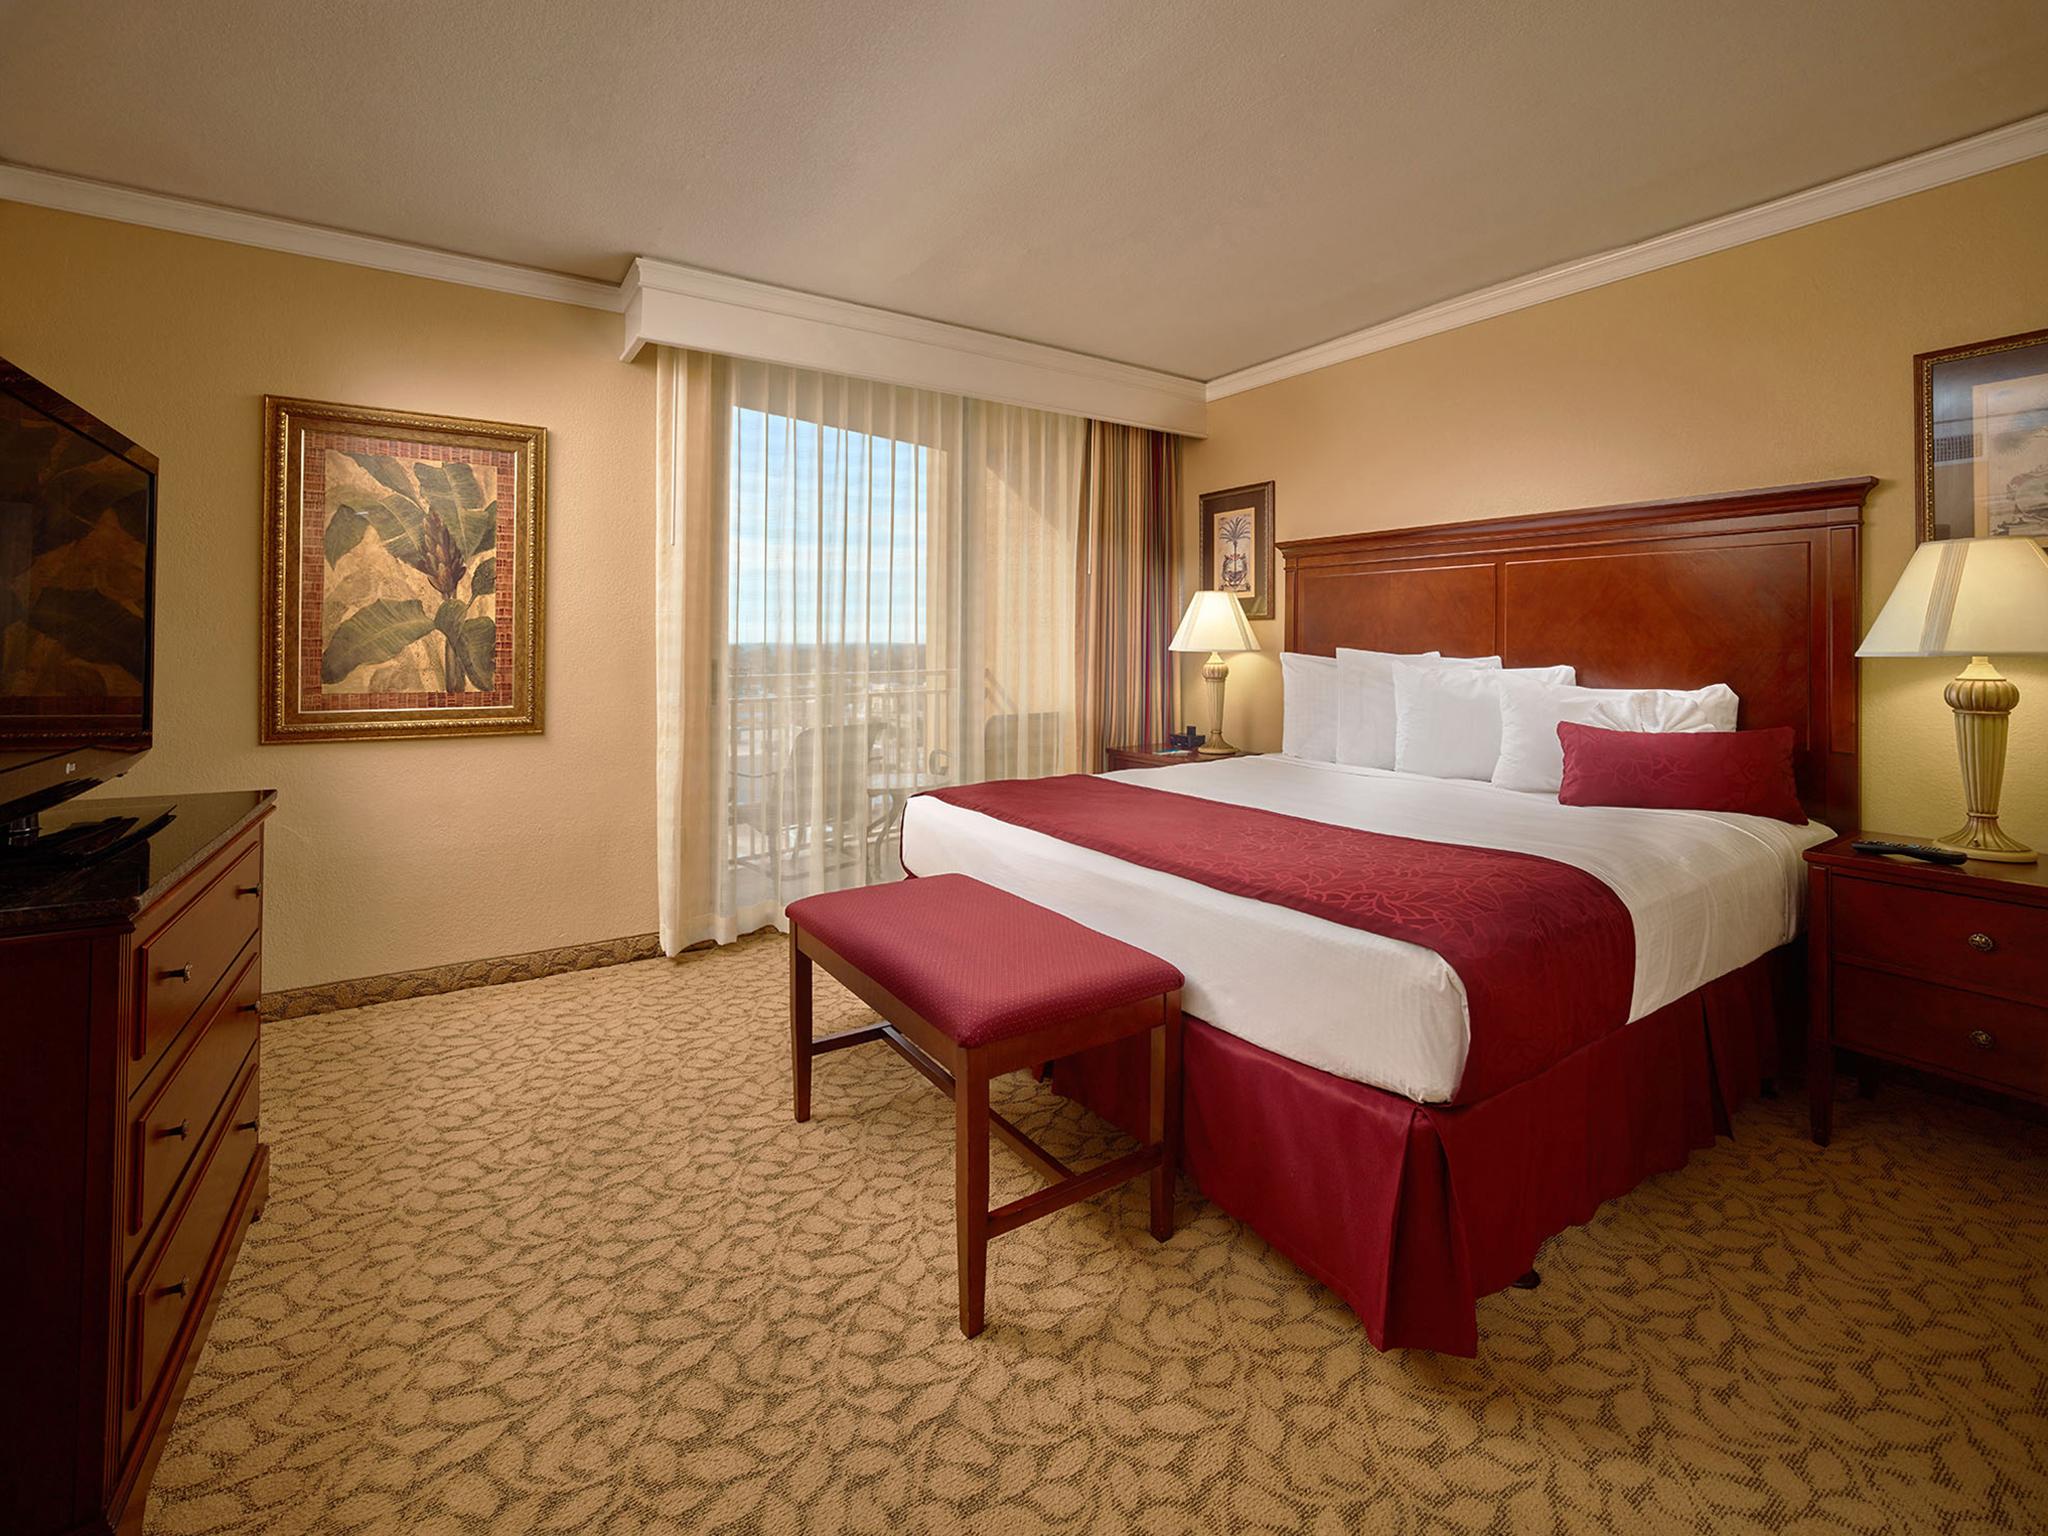 Standard King Plaza View Room